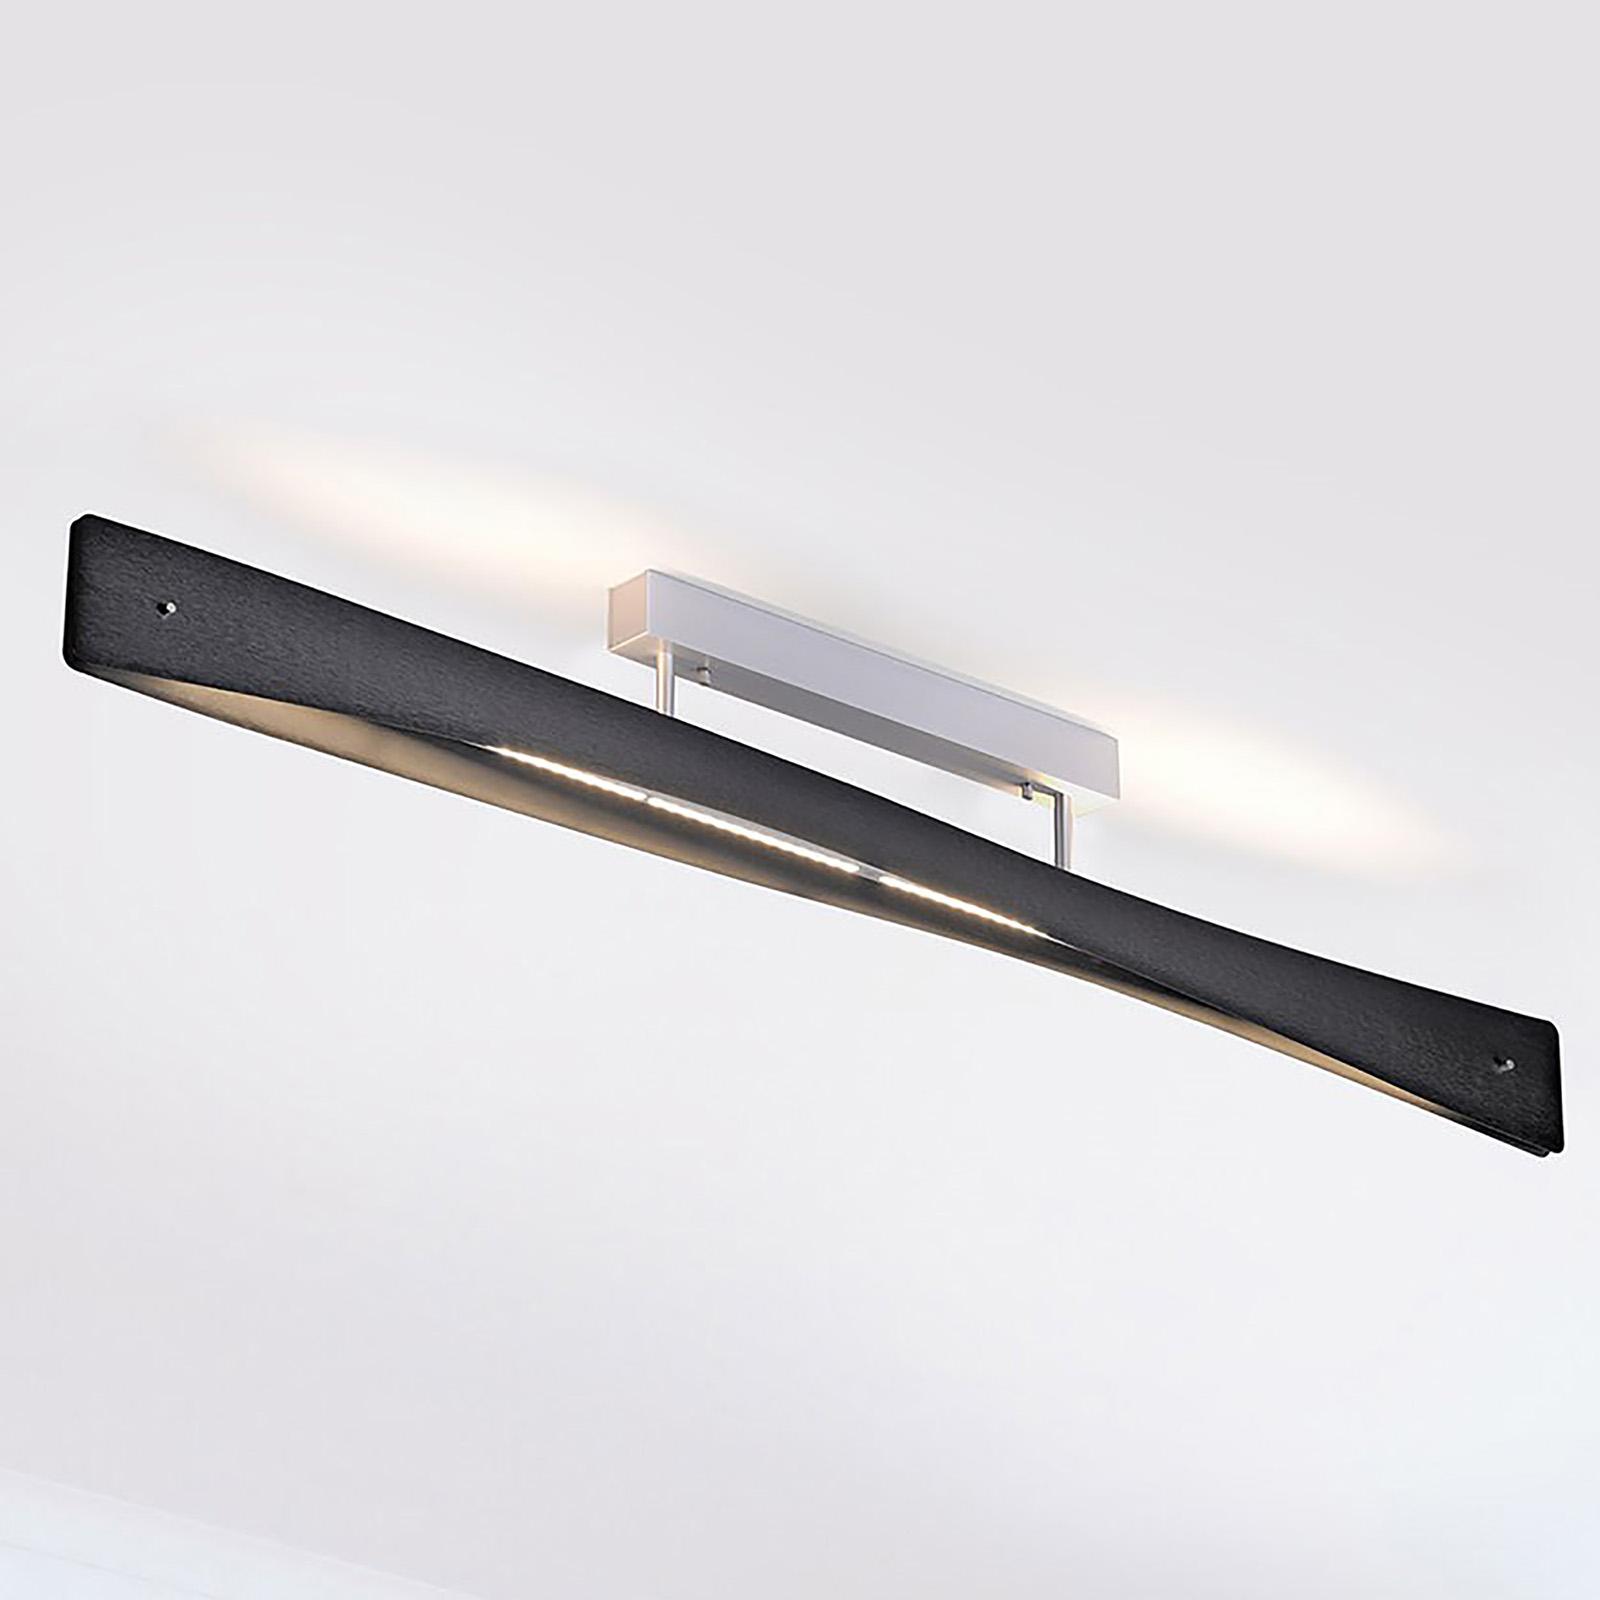 Lucande Lian LED-kattovalaisin, musta, alumiini